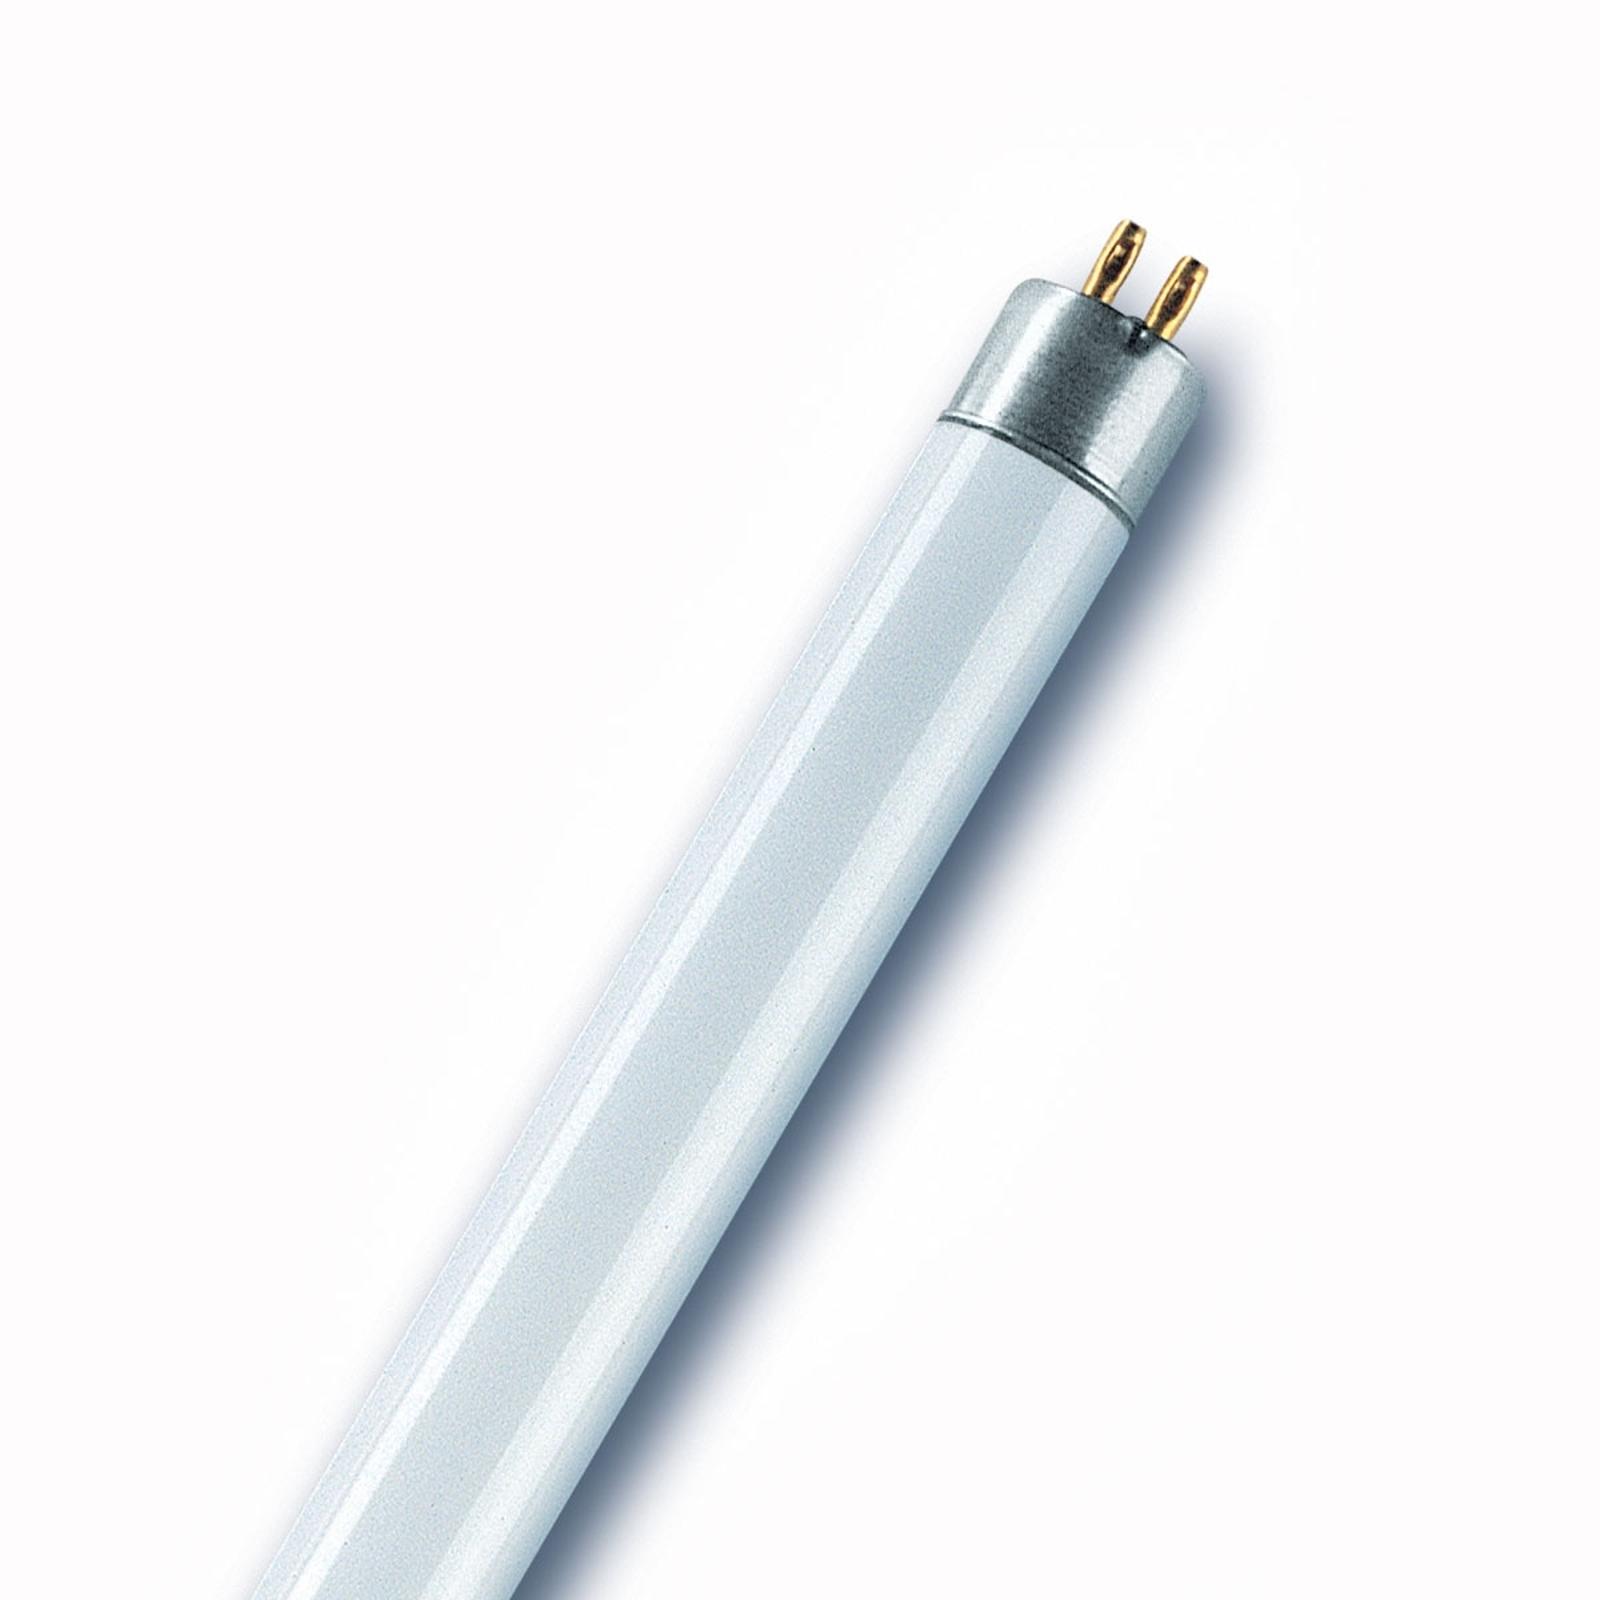 Leuchtstoffröhre G5 T5 24W 827 Lumilux HO